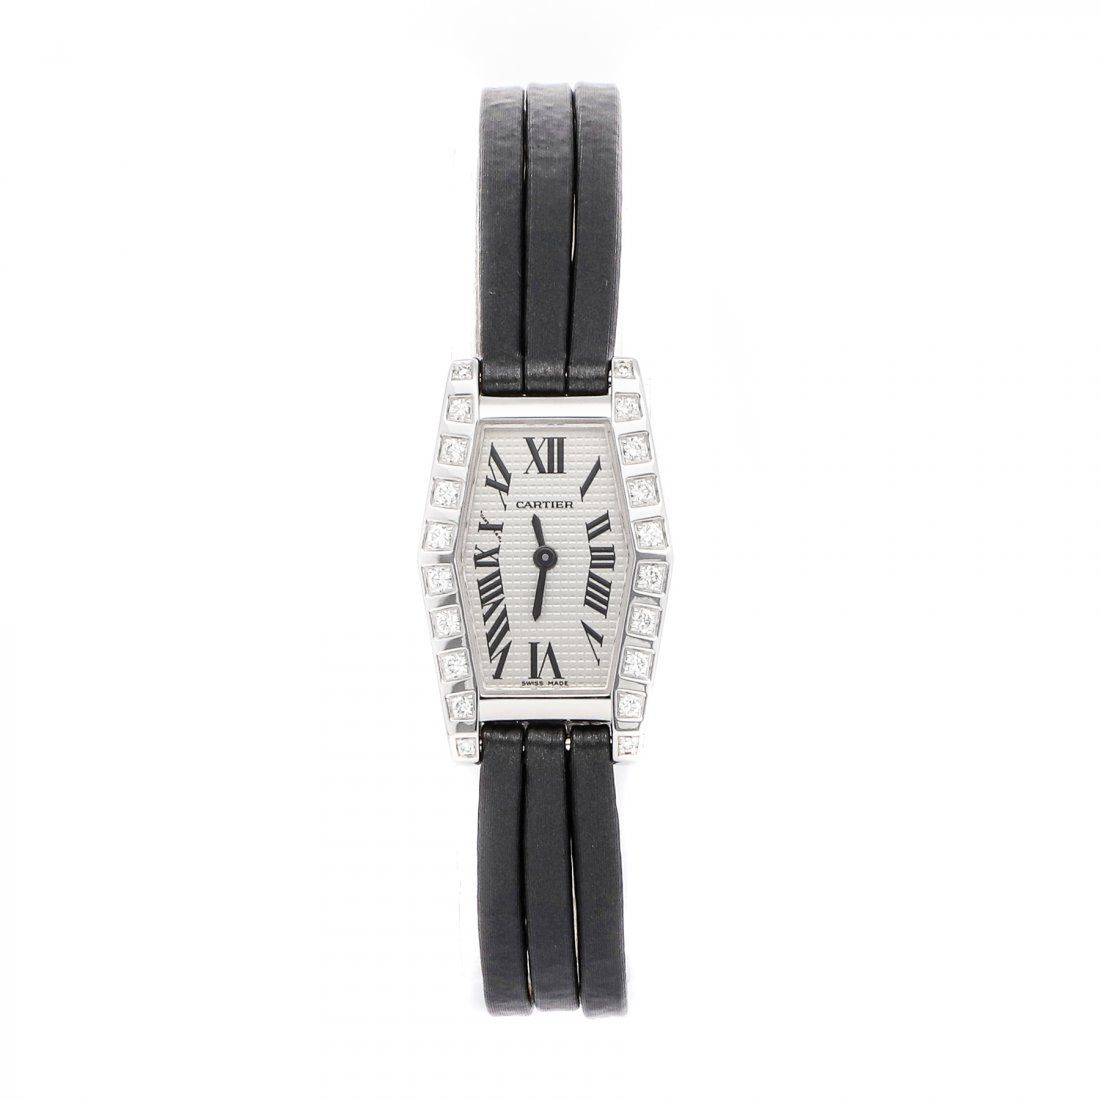 Cartier Hexagonal 18k White Gold Diamond Watch WJ200538